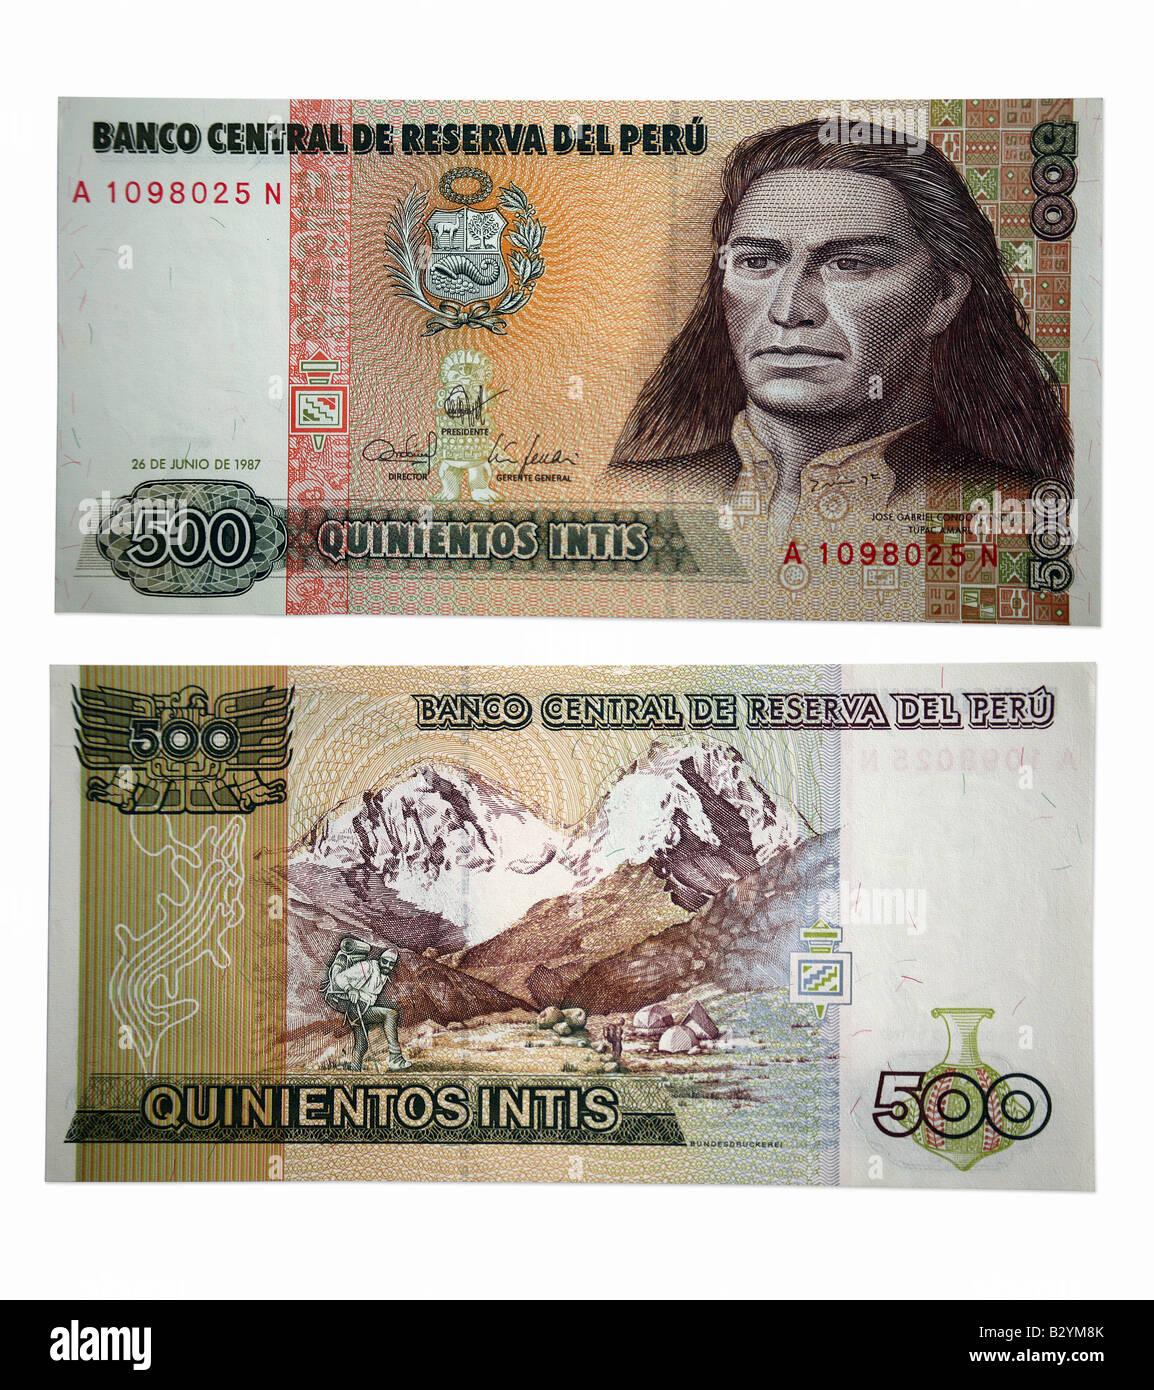 Quinientos intis 500 peru geld aus peru stockfoto bild 19048307 quinientos intis 500 peru geld aus peru thecheapjerseys Images